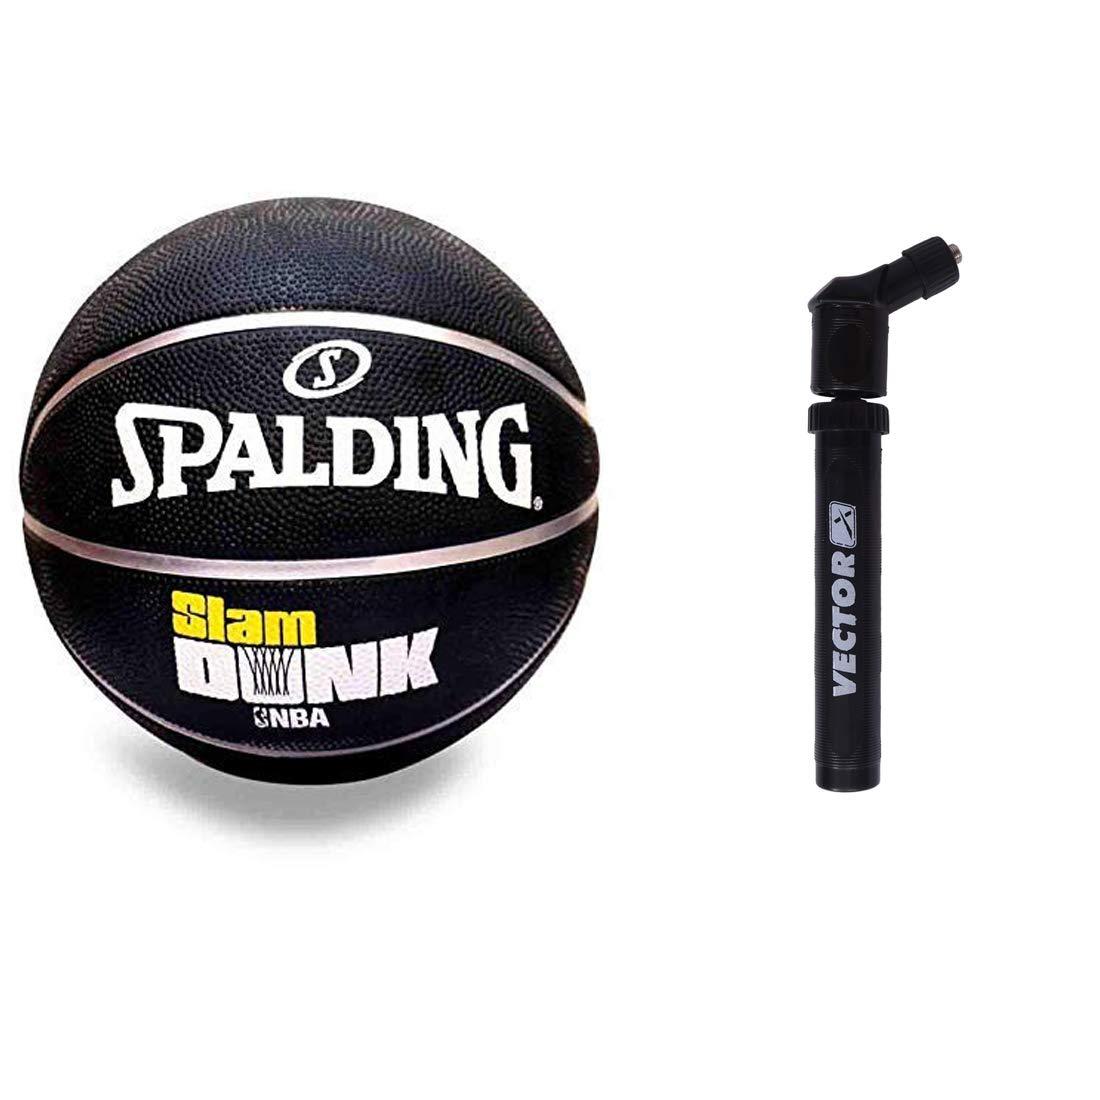 Spalding NBA Slamdunk Rubber Basketball with Air Pump